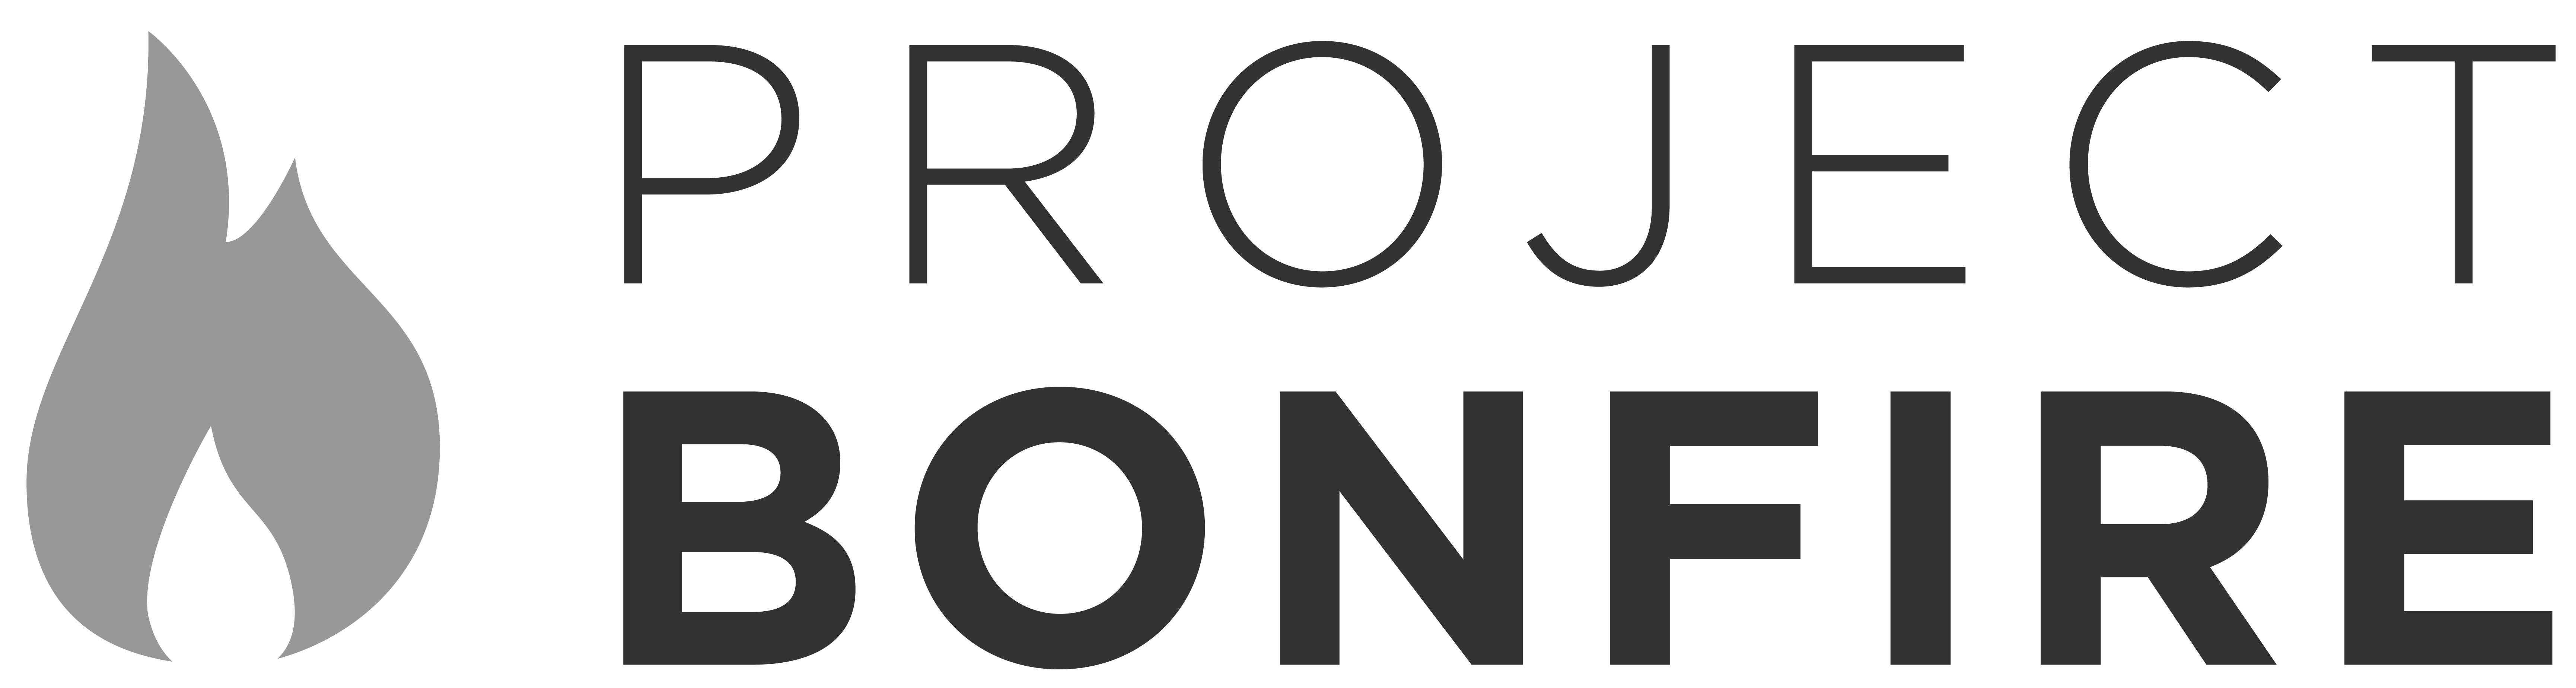 in2innovation Project Bonfire logo